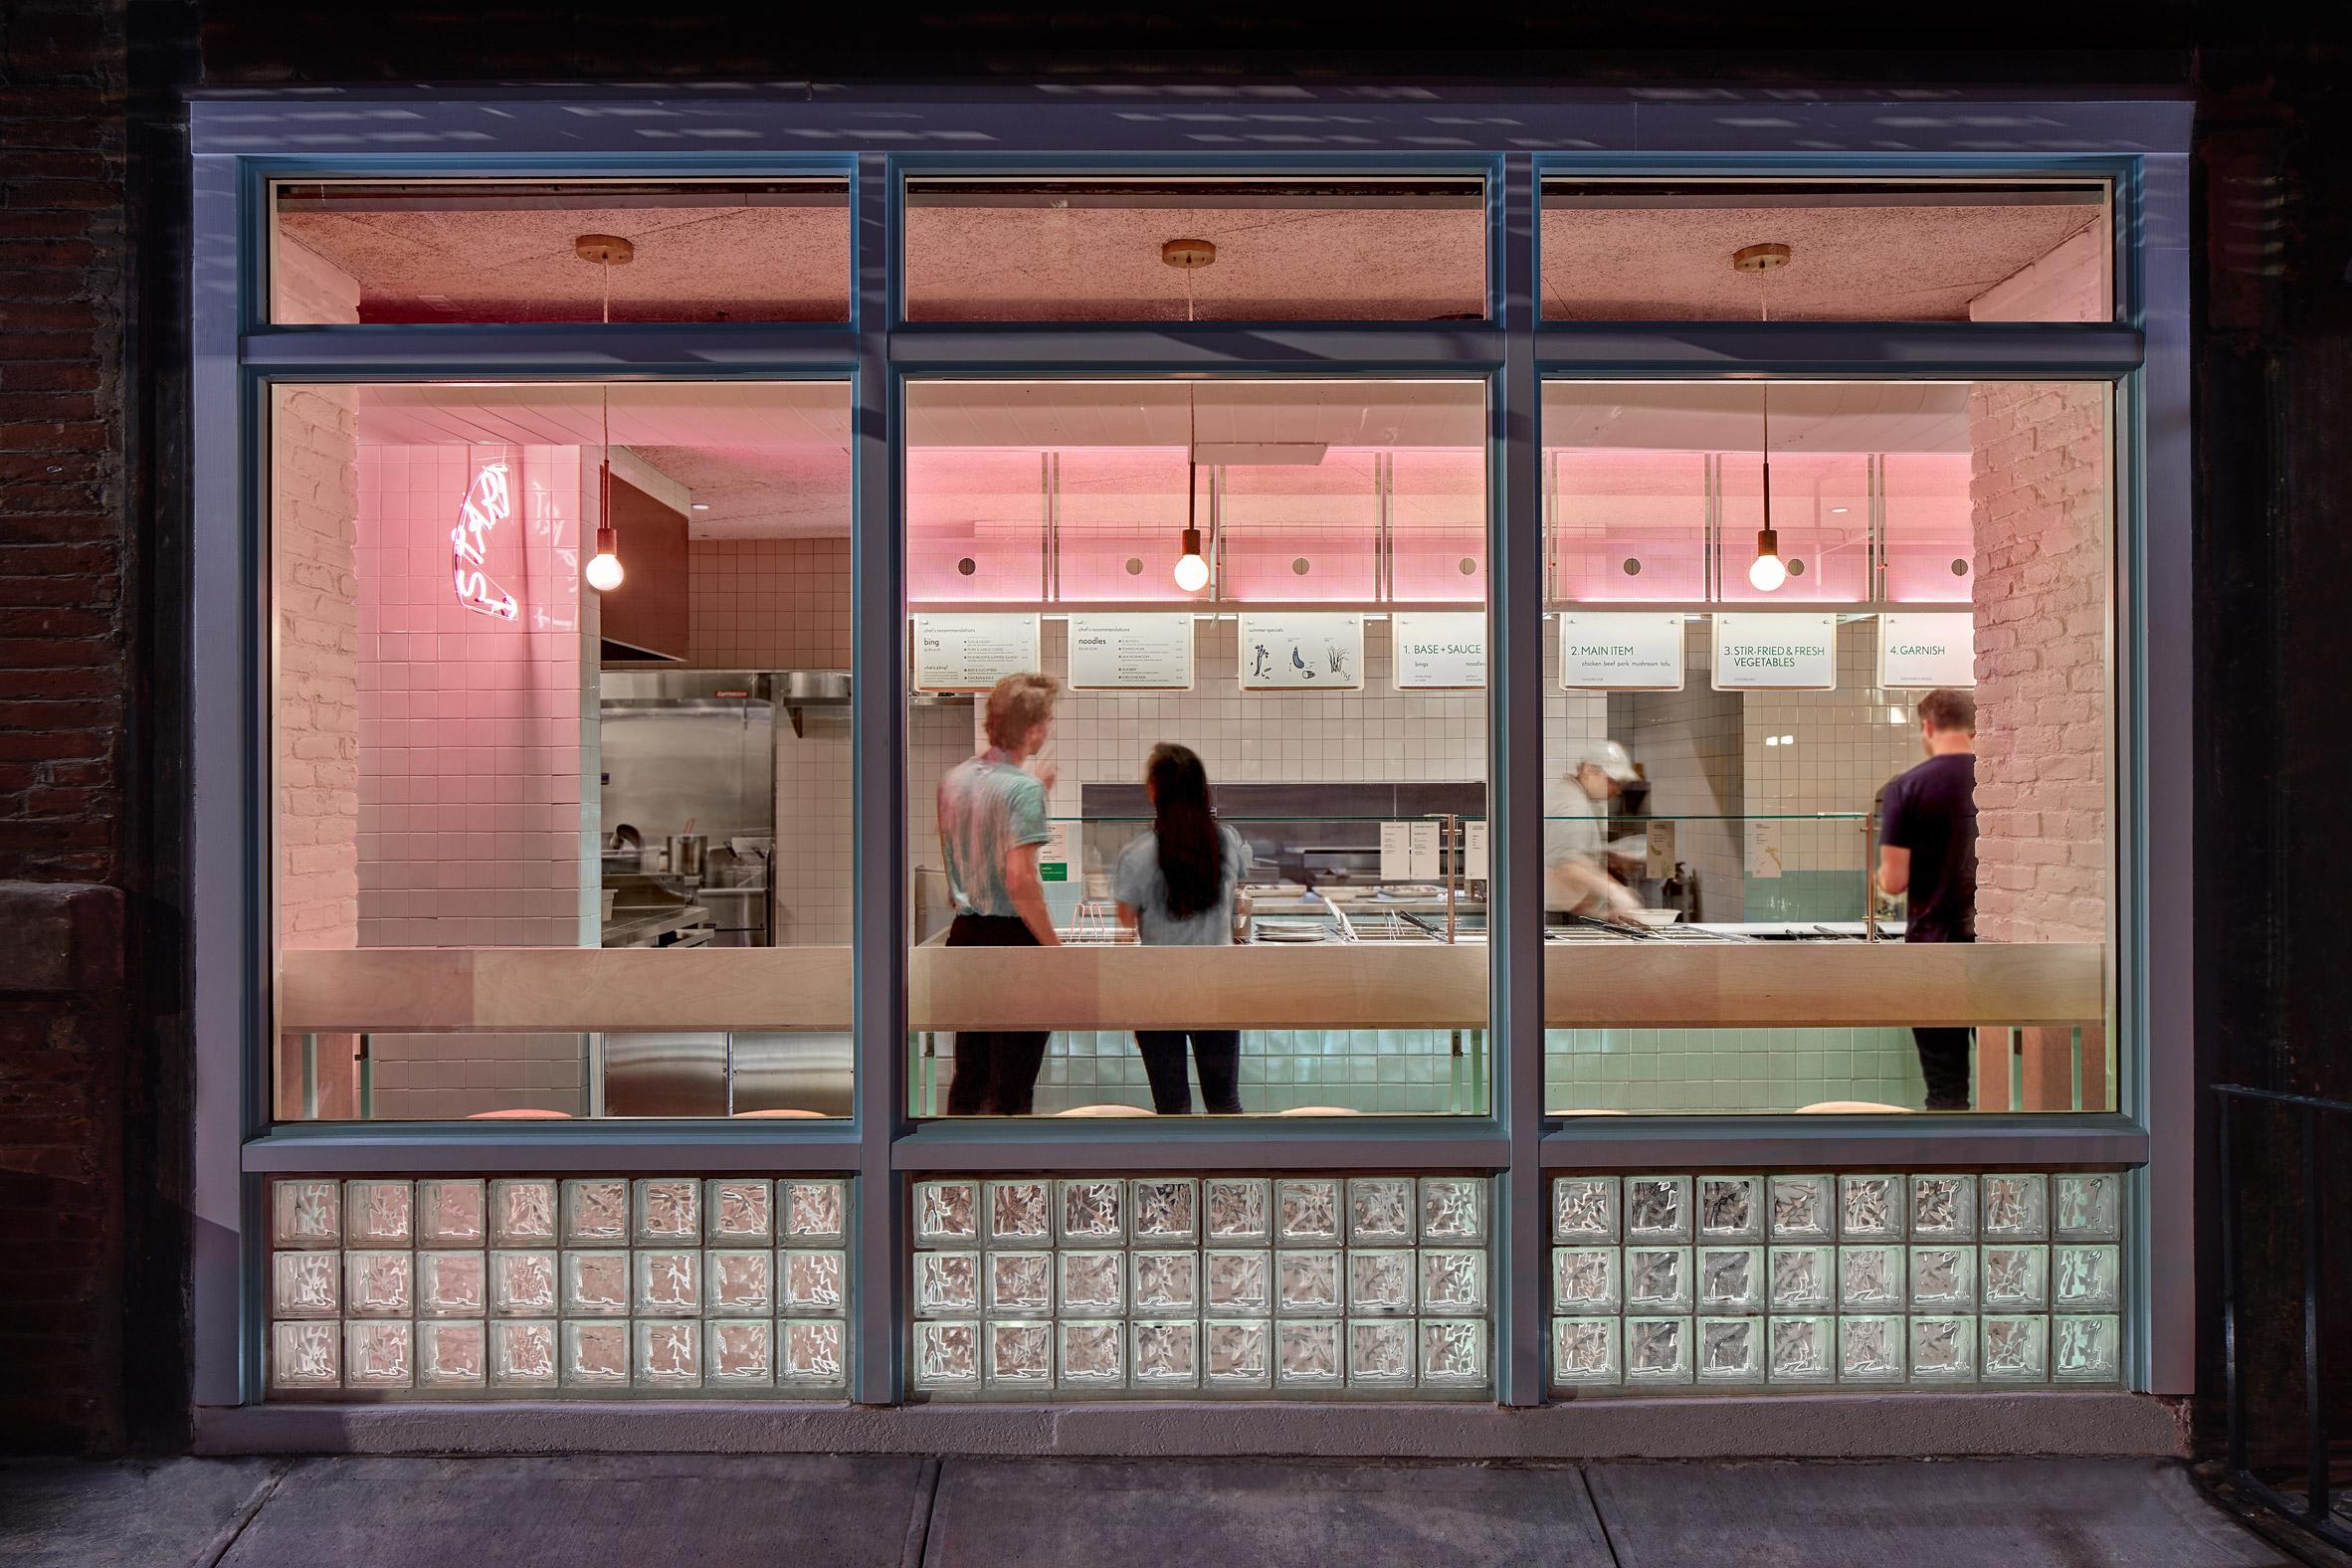 junzi-kitchen-xuhui-zhang-interiors-restaurant-new-york-city-usa_dezeen_2364_col_8.jpg